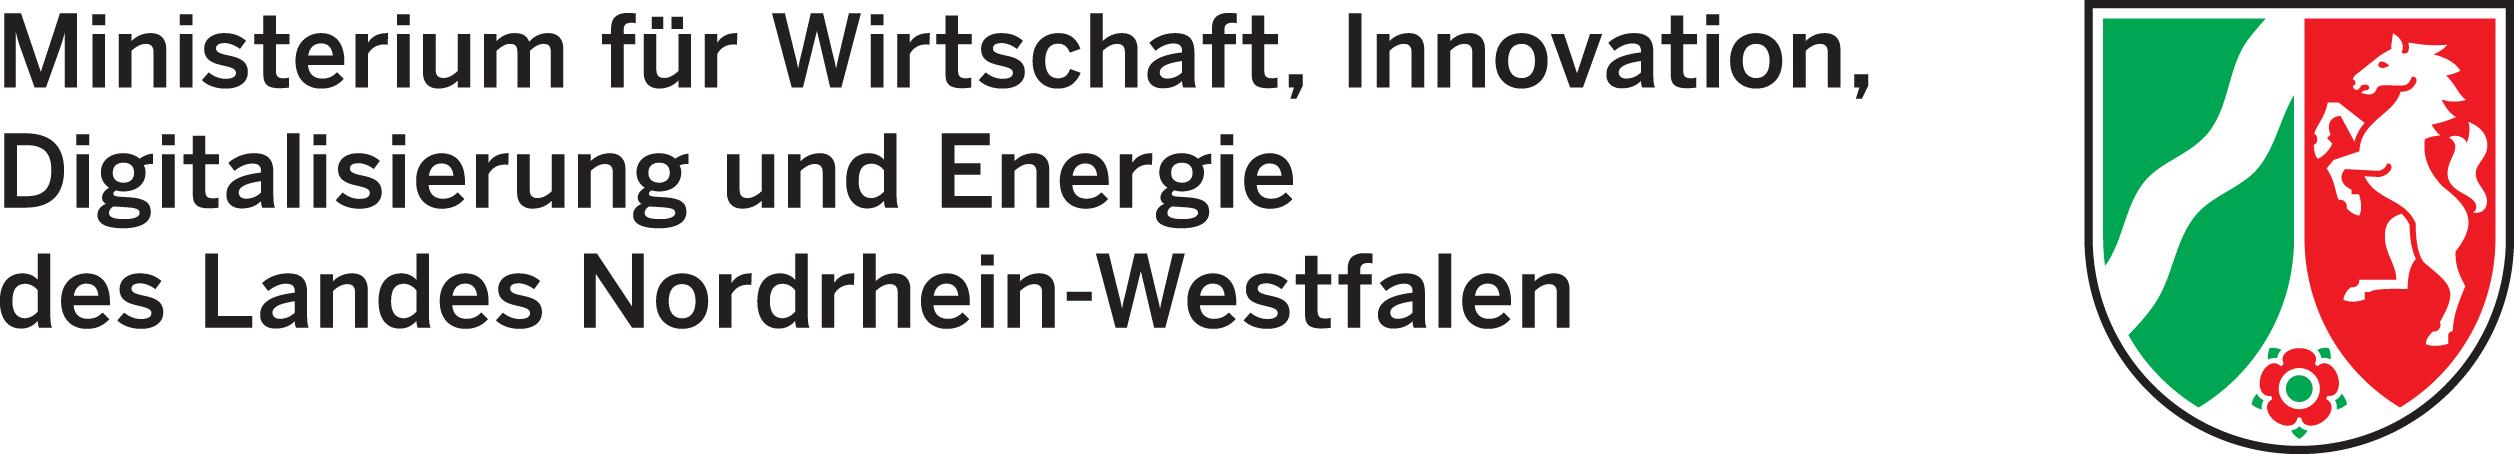 RegioCall EFRE.NRW: eurobits